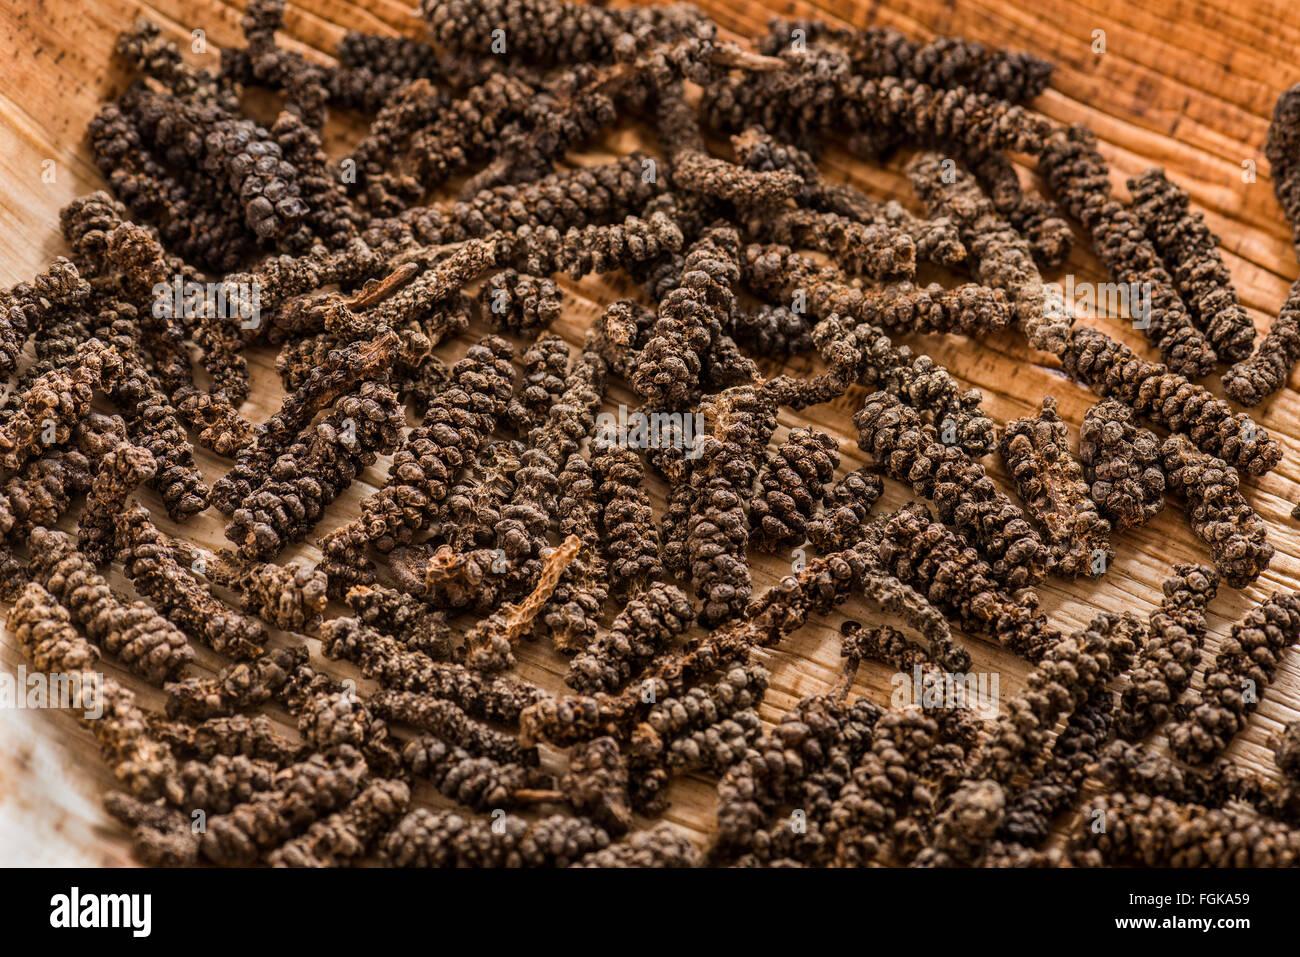 Piperaceae Piper longum, lungo il pepe, Javanese pepe, Indiano indonesiano pepe lungo l'India, Bengali pepe, spice, Foto Stock